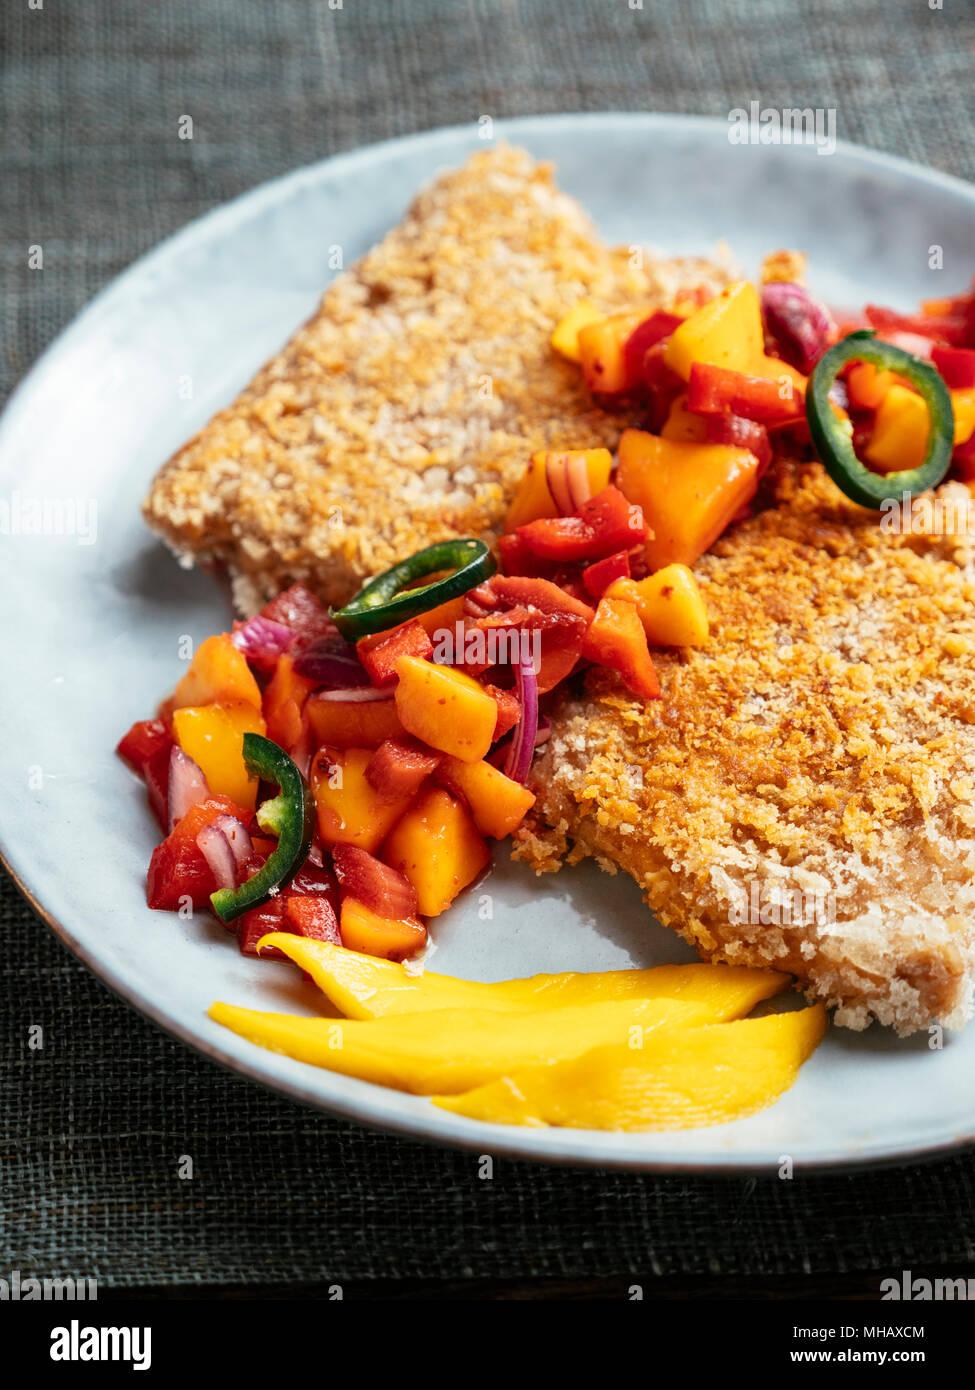 TVP Schnitzels with a Mango, Rhubarb Salsa - Stock Image